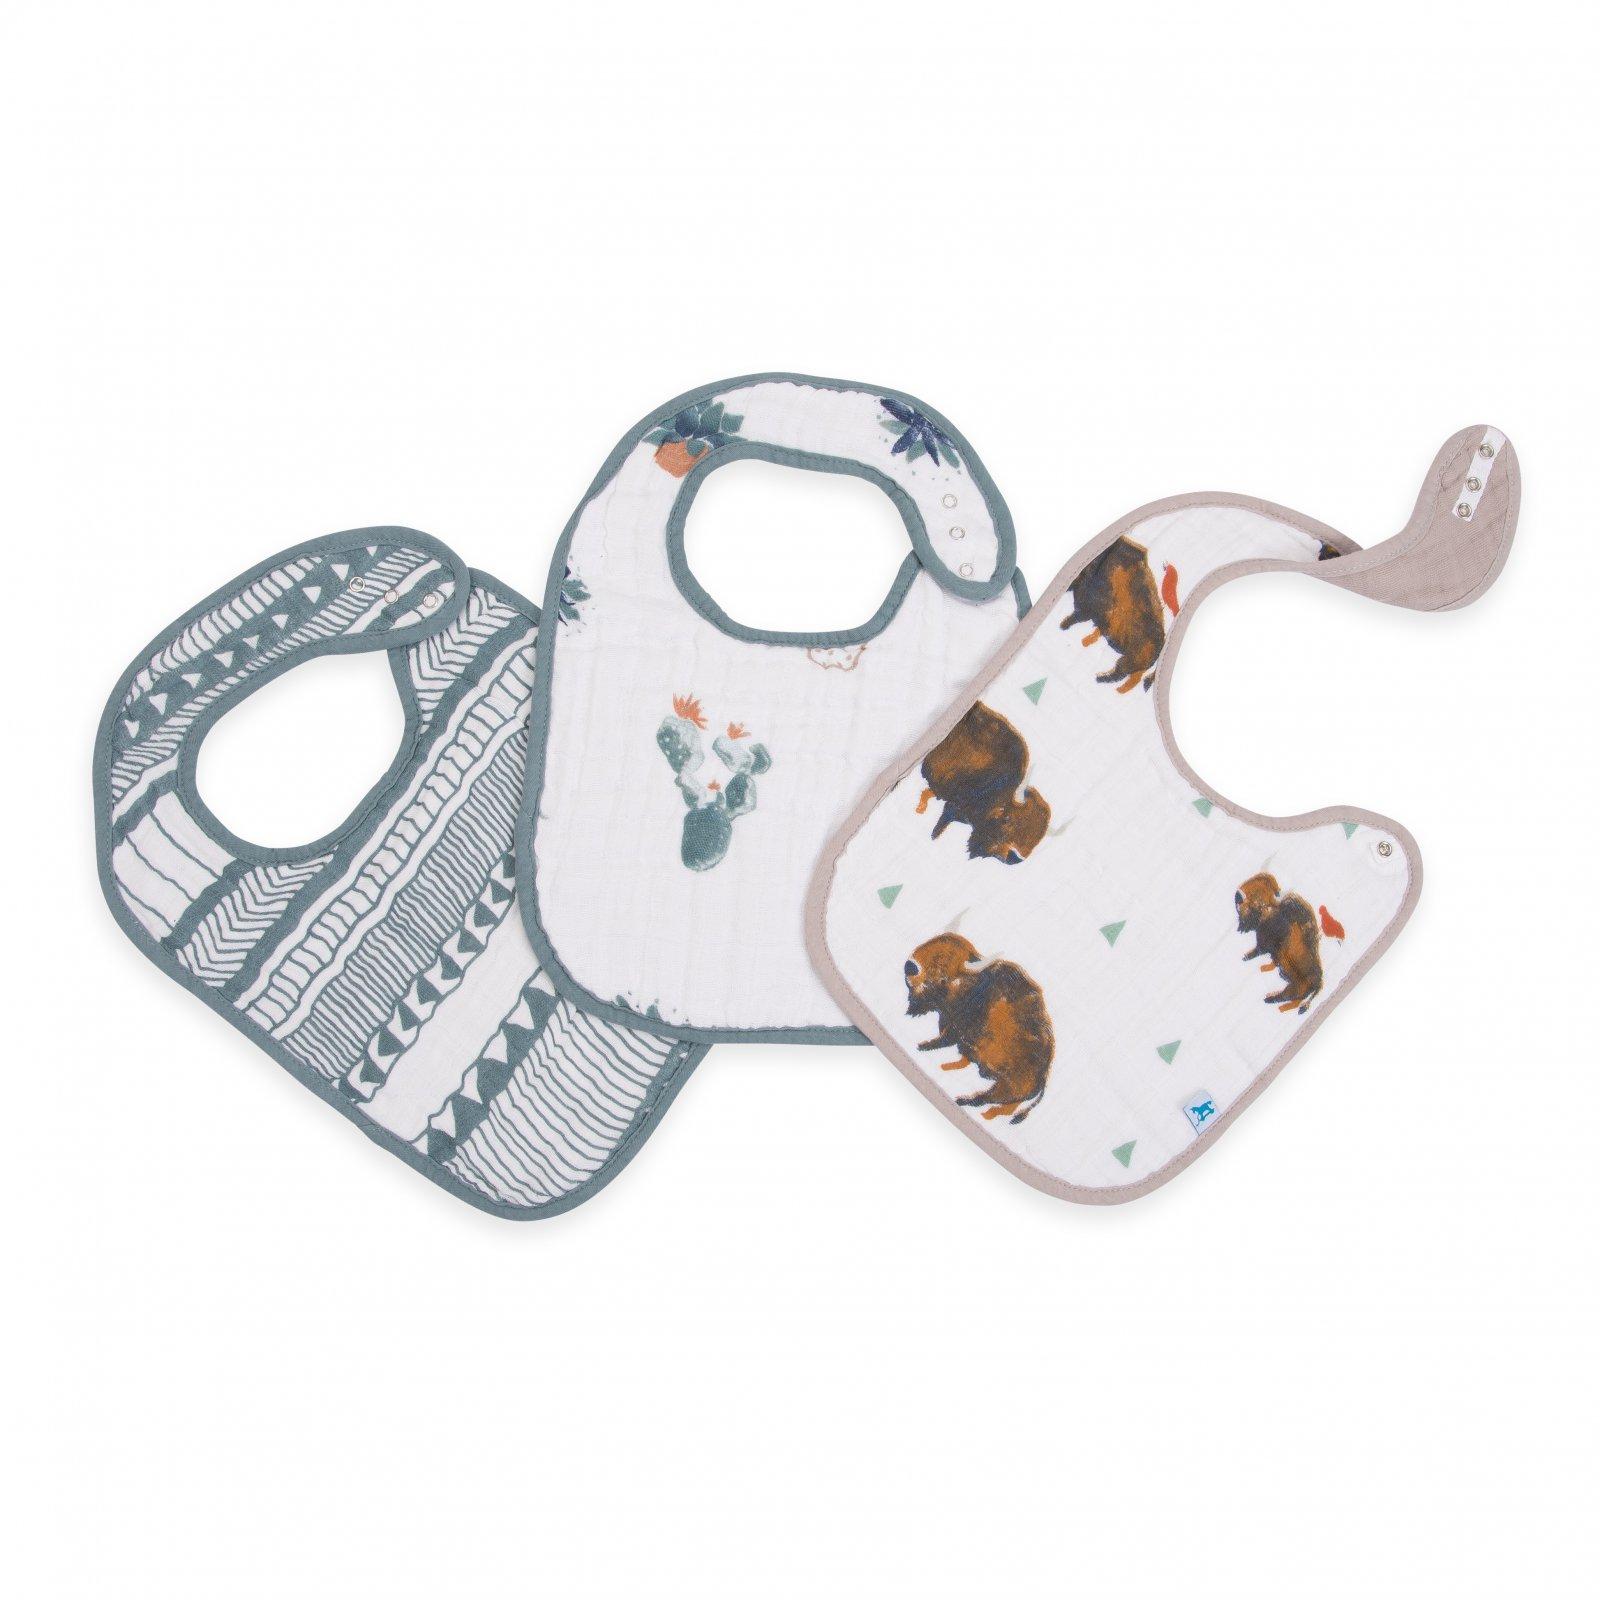 Little Unicorn Cotton Muslin Classic Bib 3 Pack - Bison